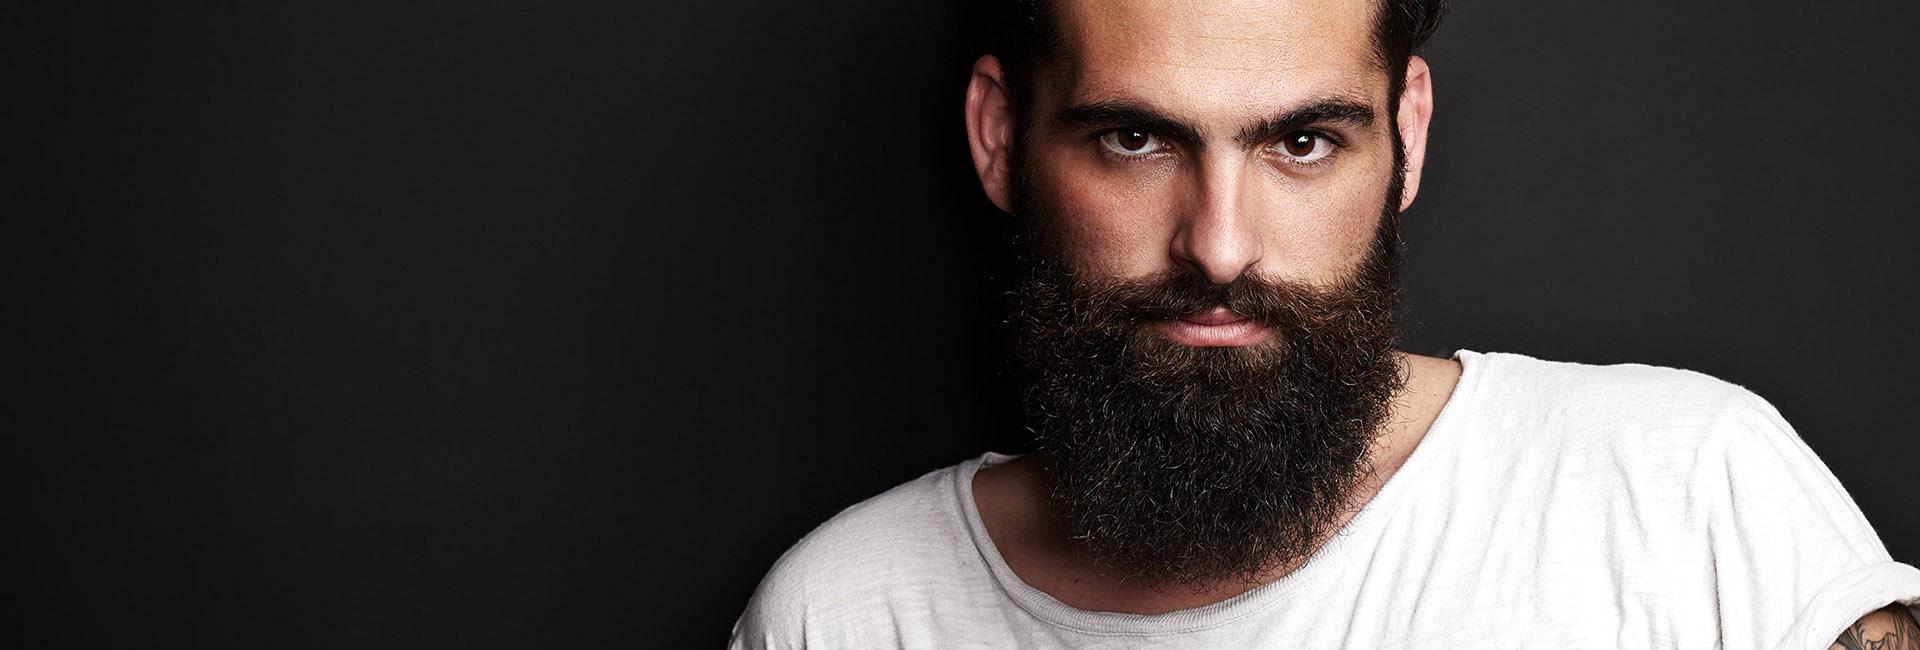 barber-slideshow-15